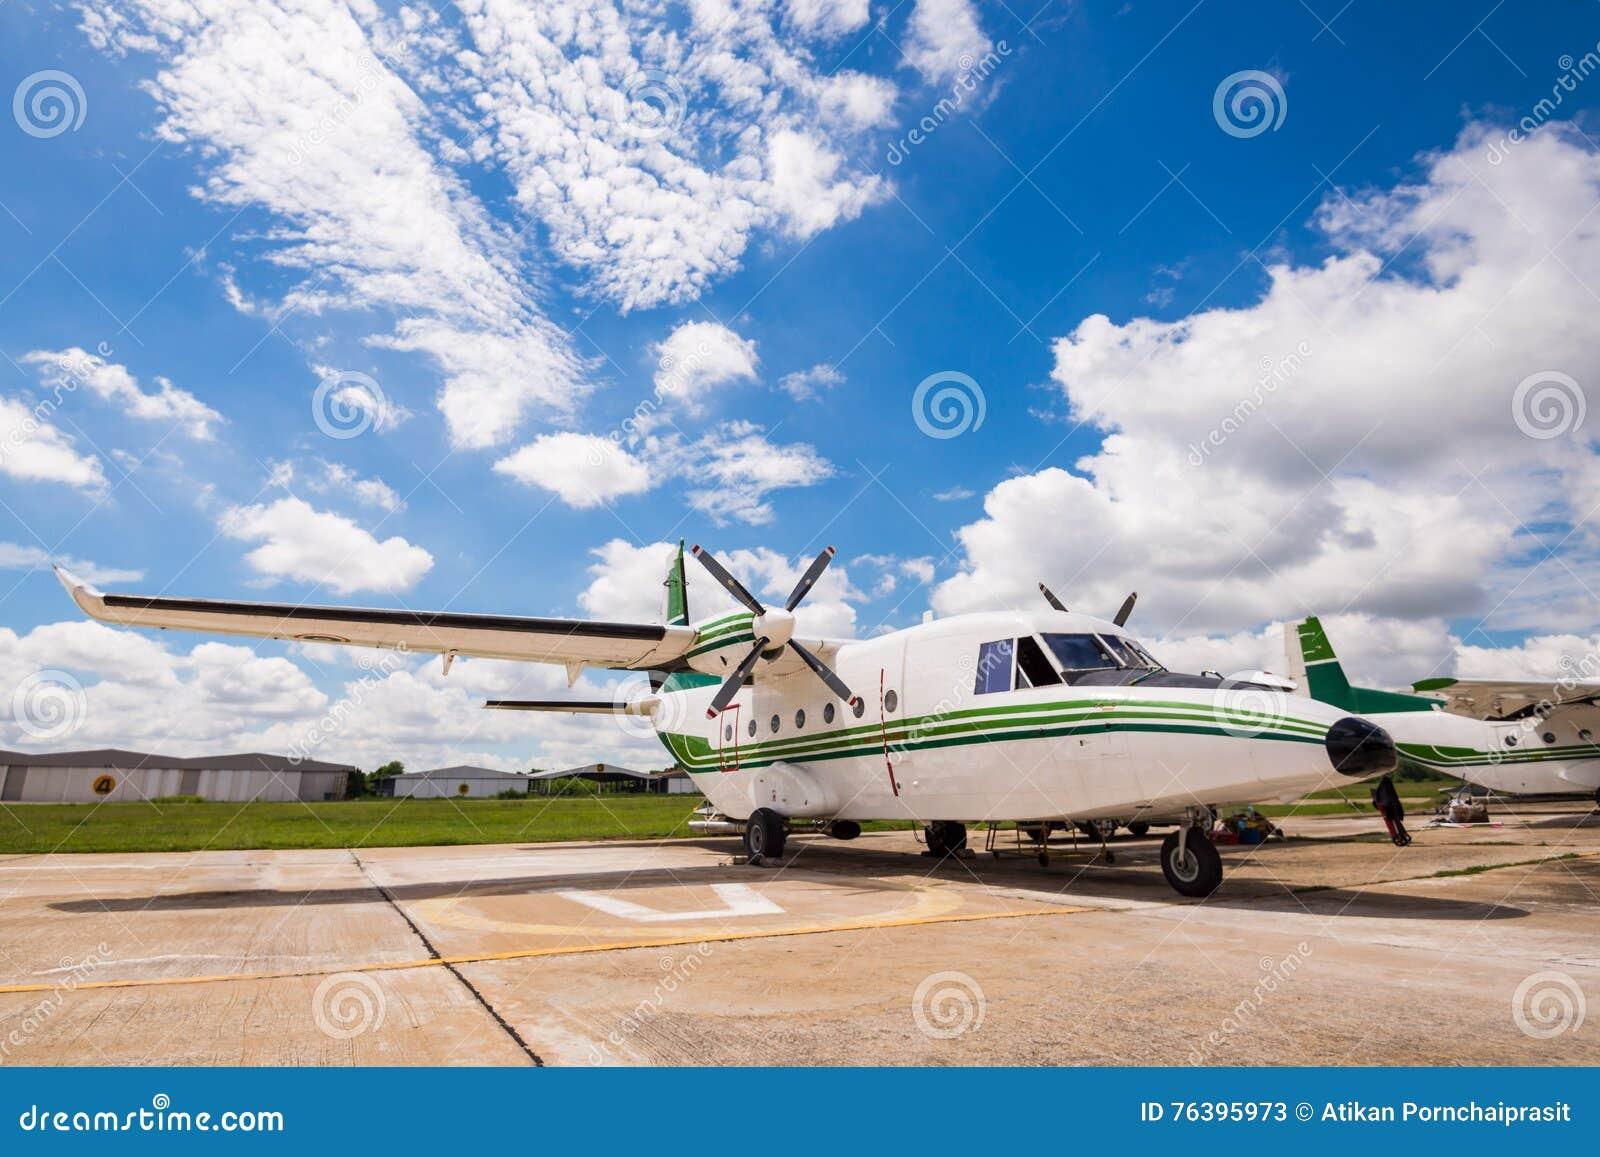 The plane made artificial rain